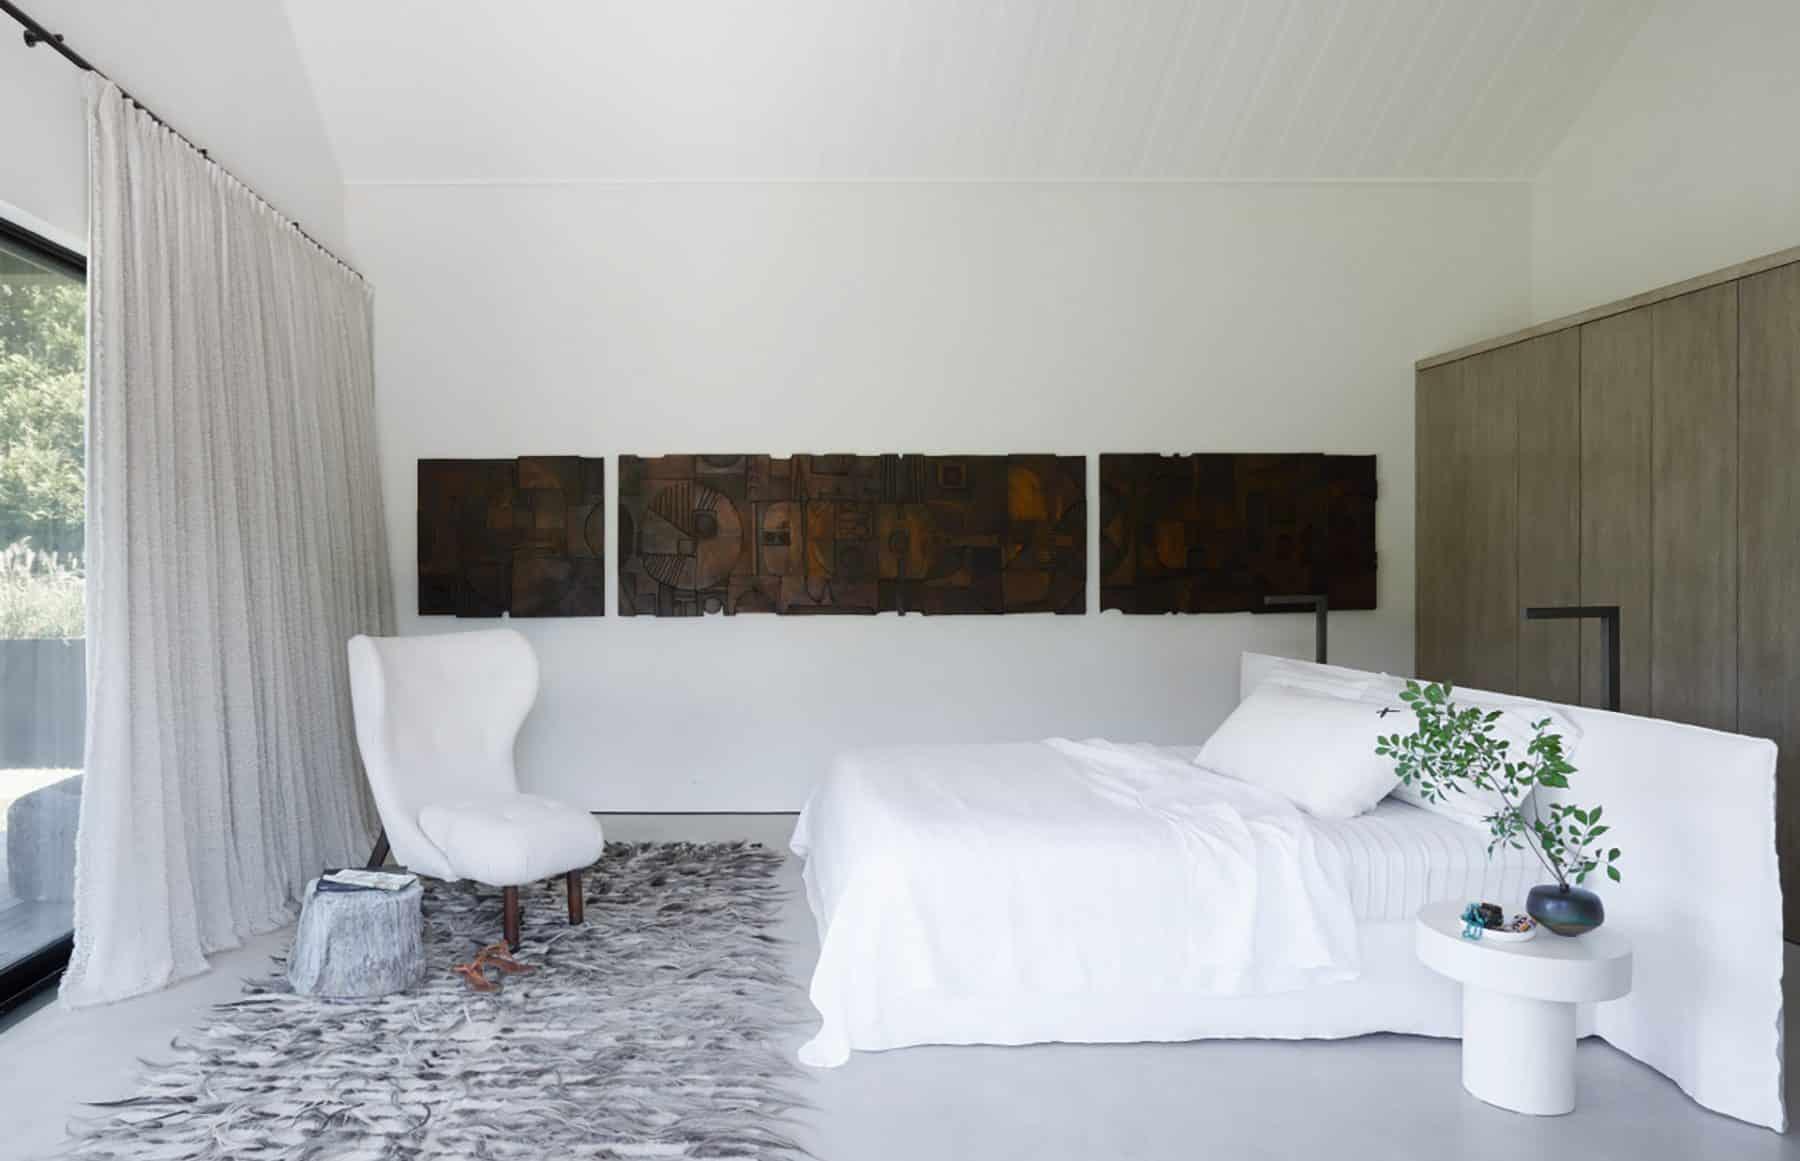 The master bedroom in Michael Del Piero's Amagansett, New York, home